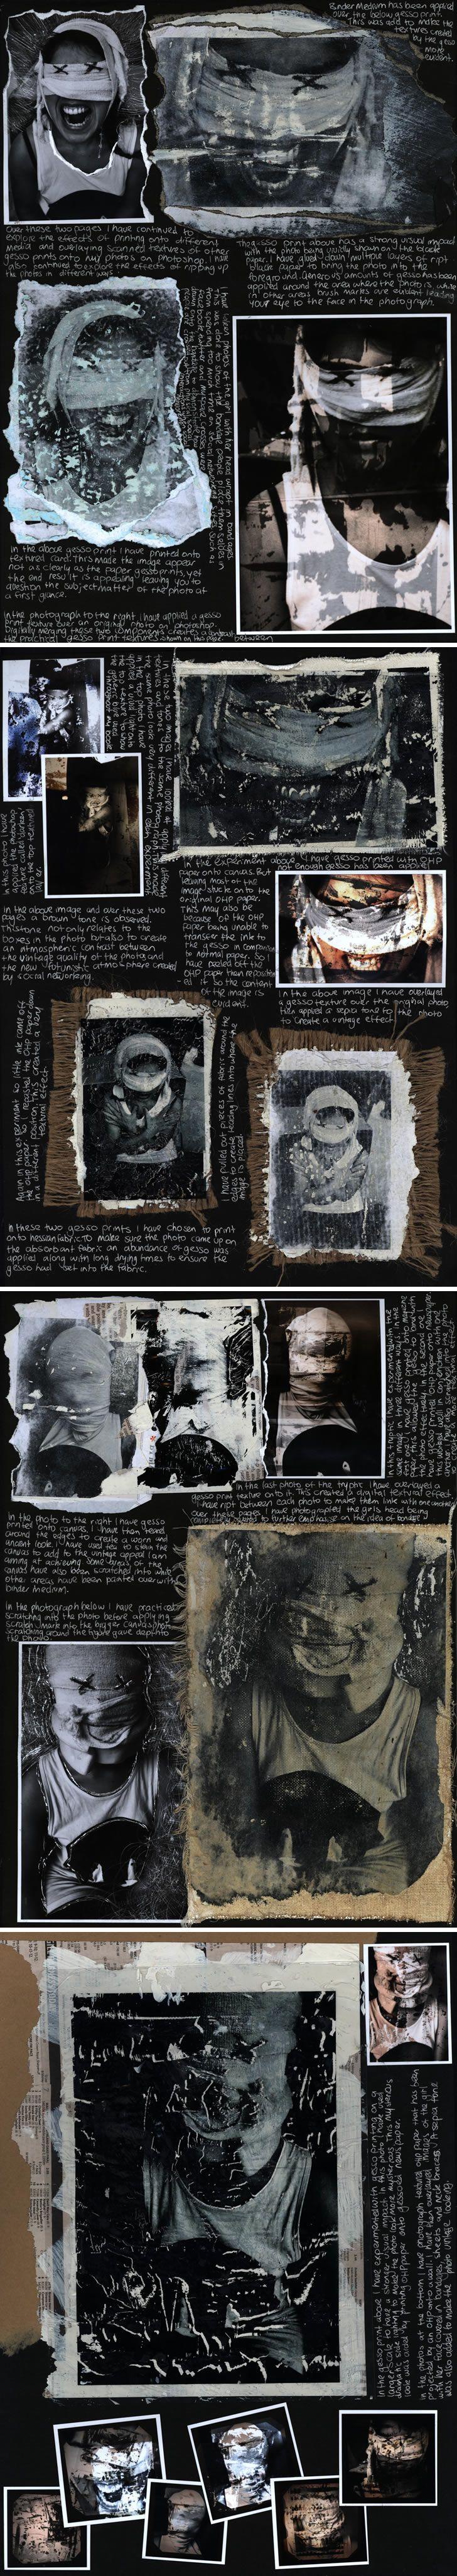 wrapped bandages: creative portraiture ideas